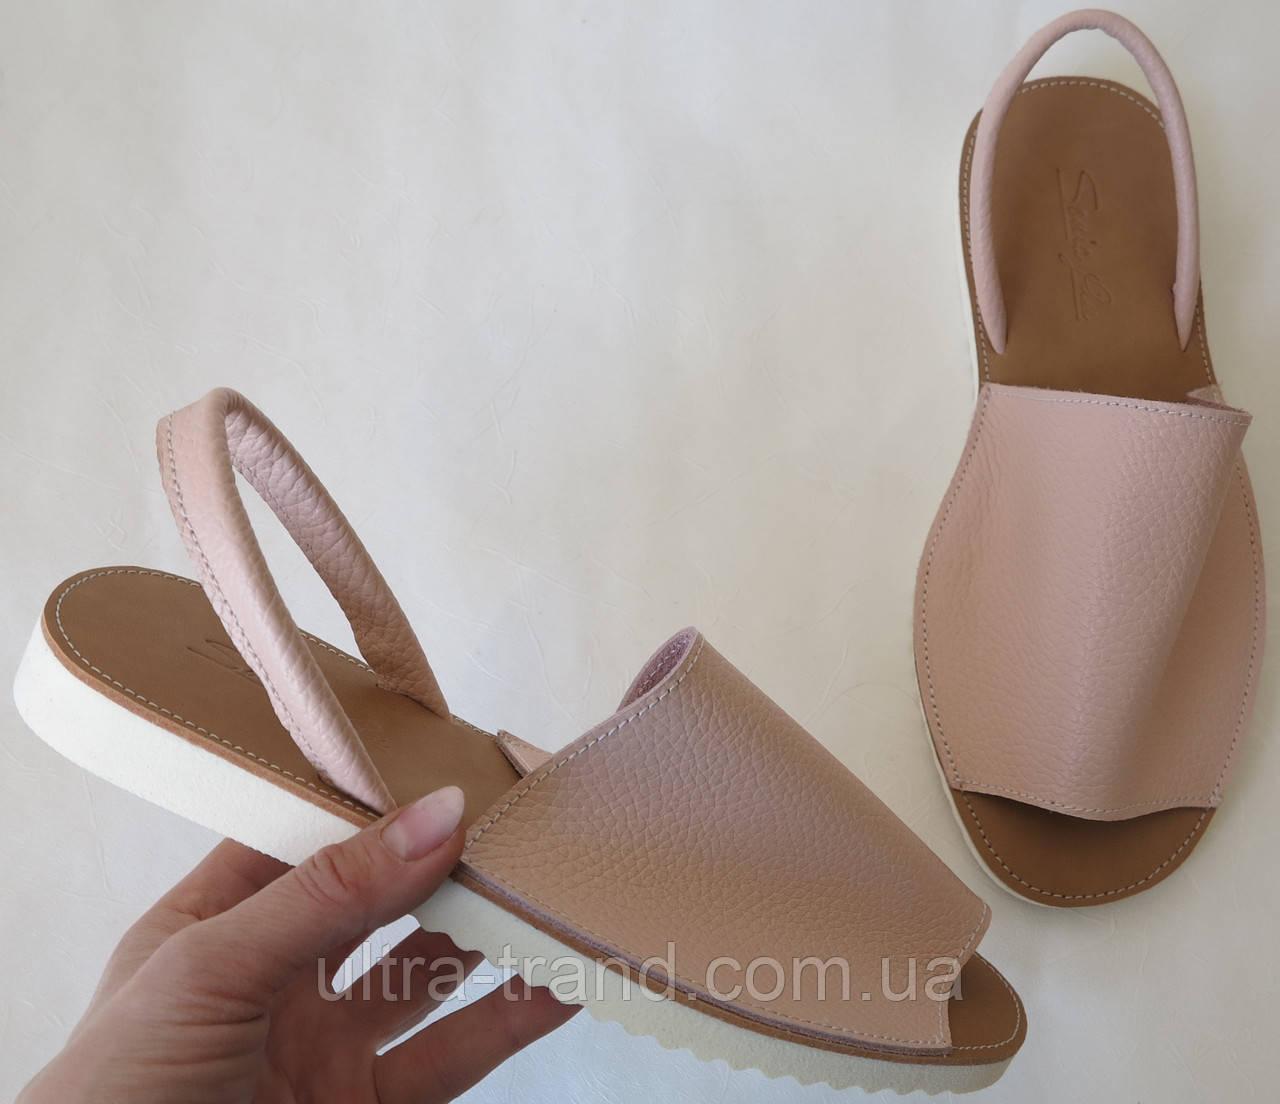 Стиляшки! Женские кожаные сандалии испанка! Летнии босоножки менорки цвет пудра